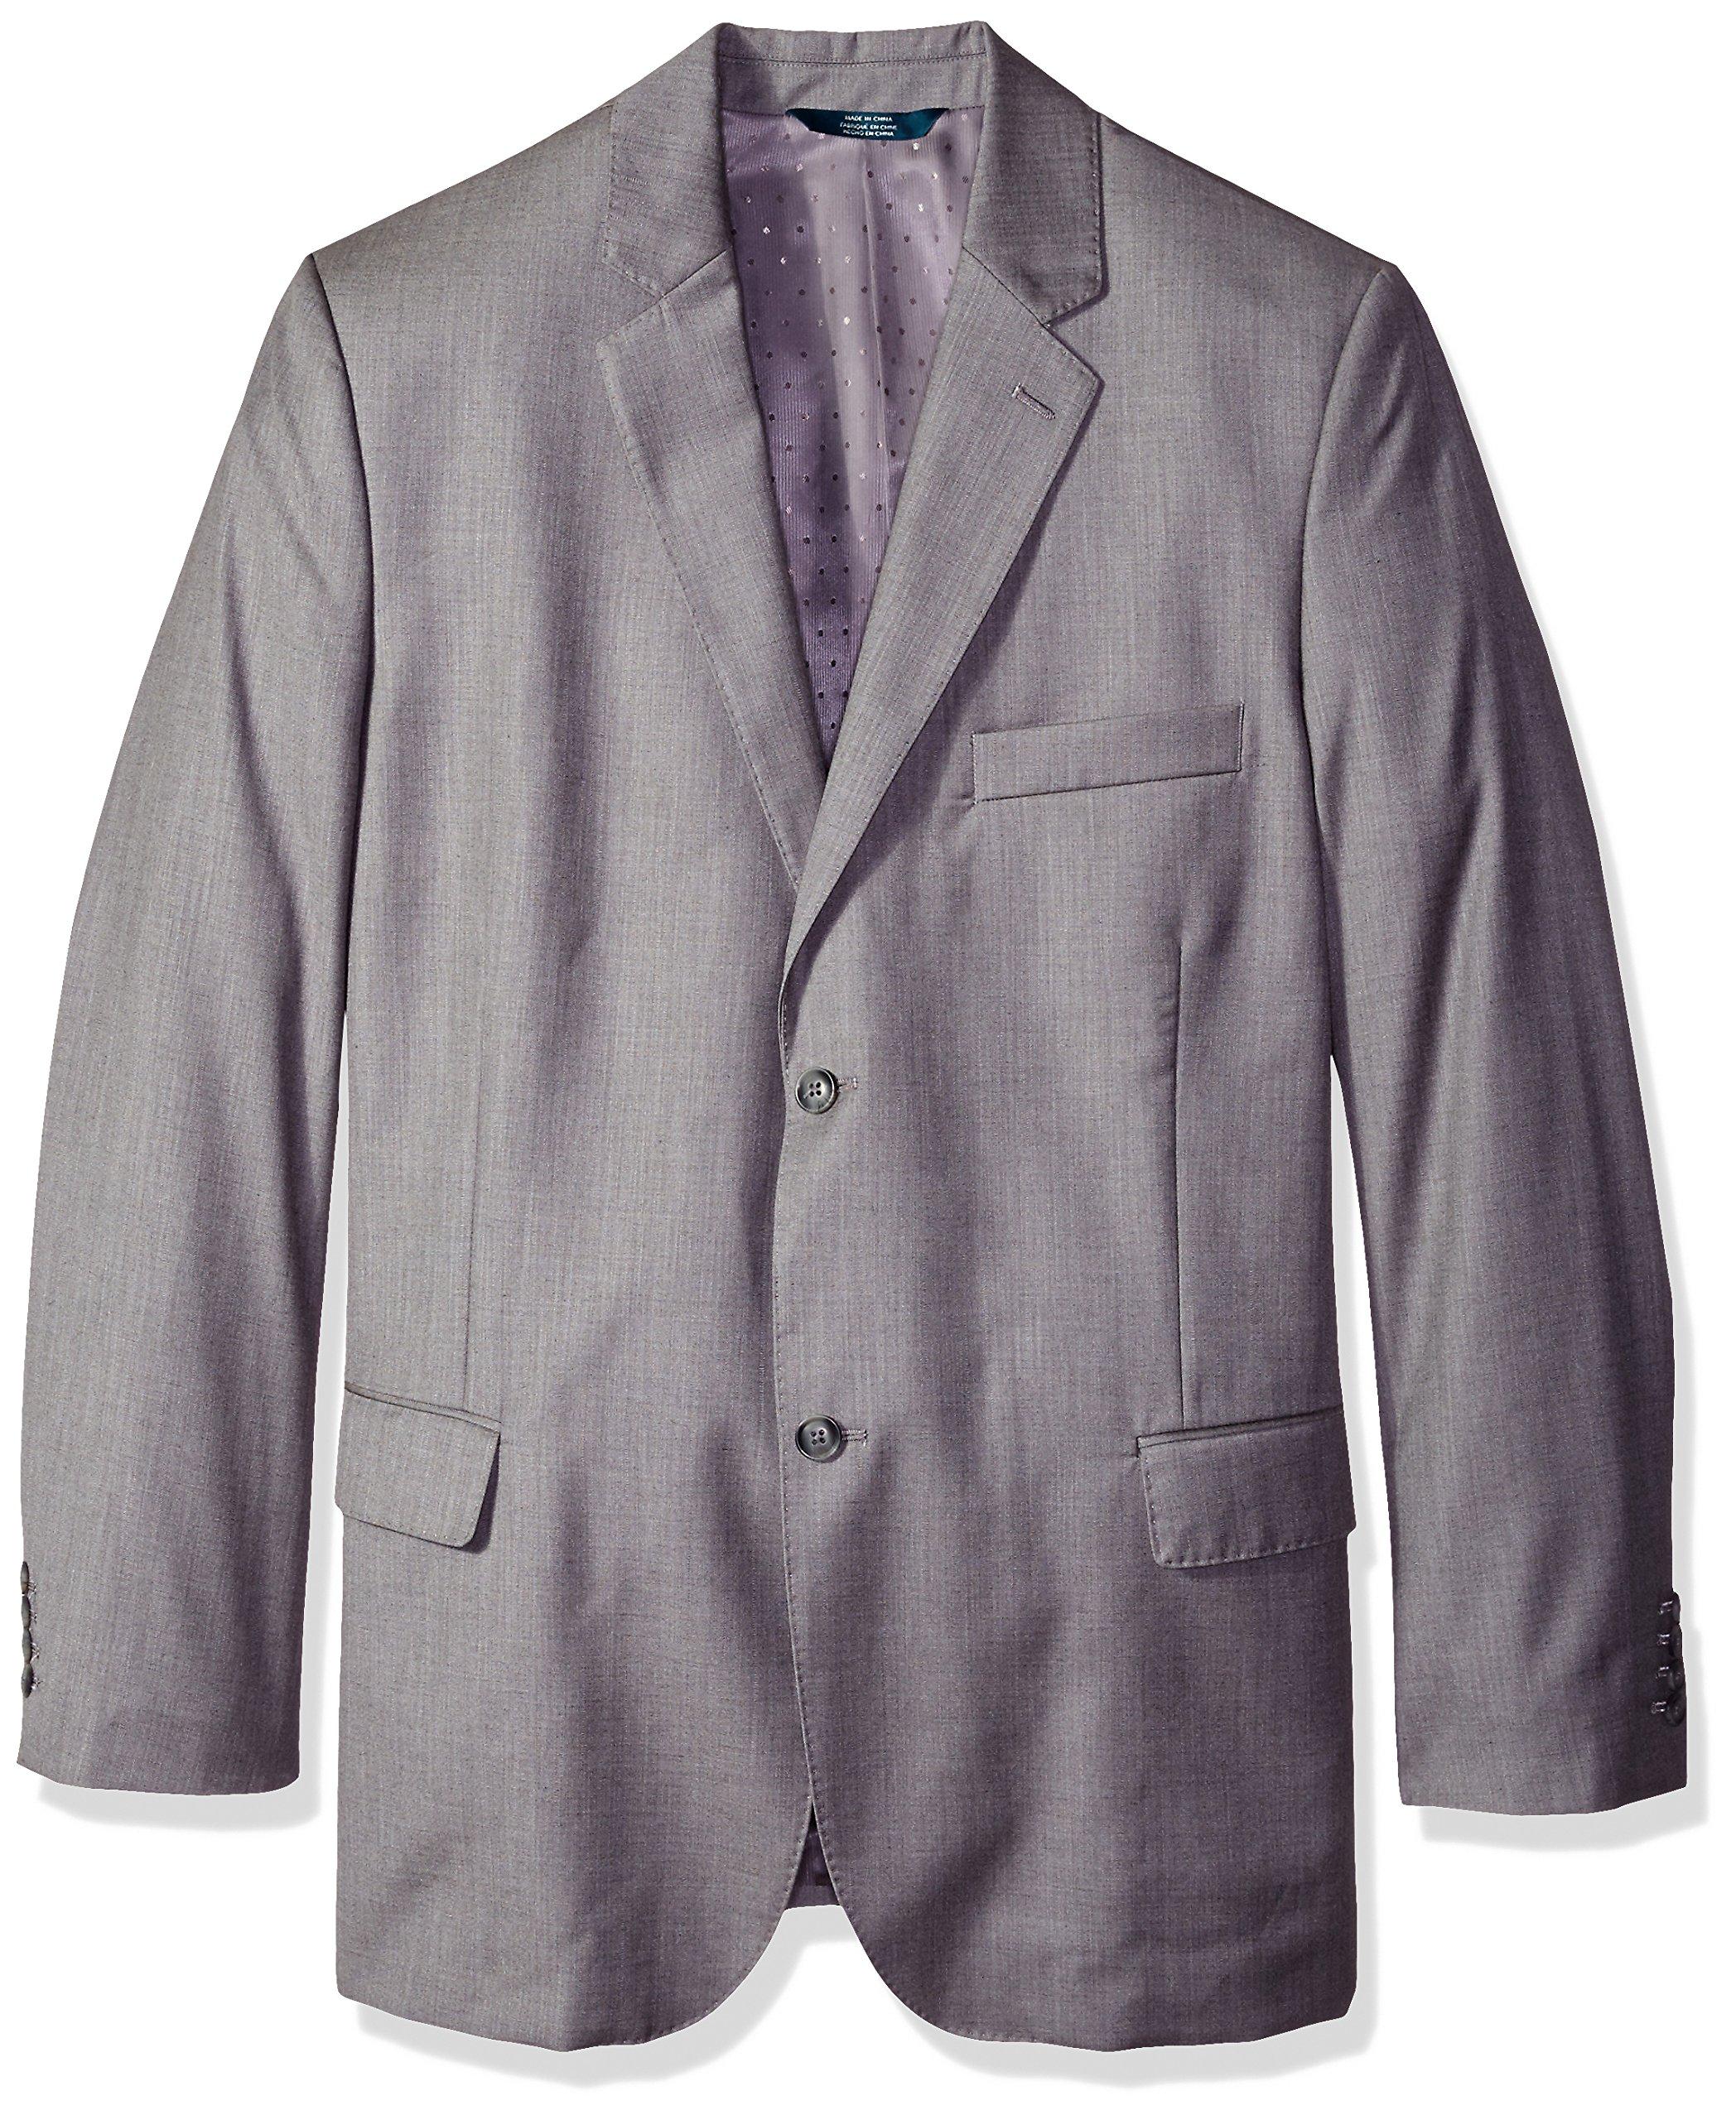 Perry Ellis Men's Tall Texture Pvl Suit Jacket, Brushed Nickel, 52 Big